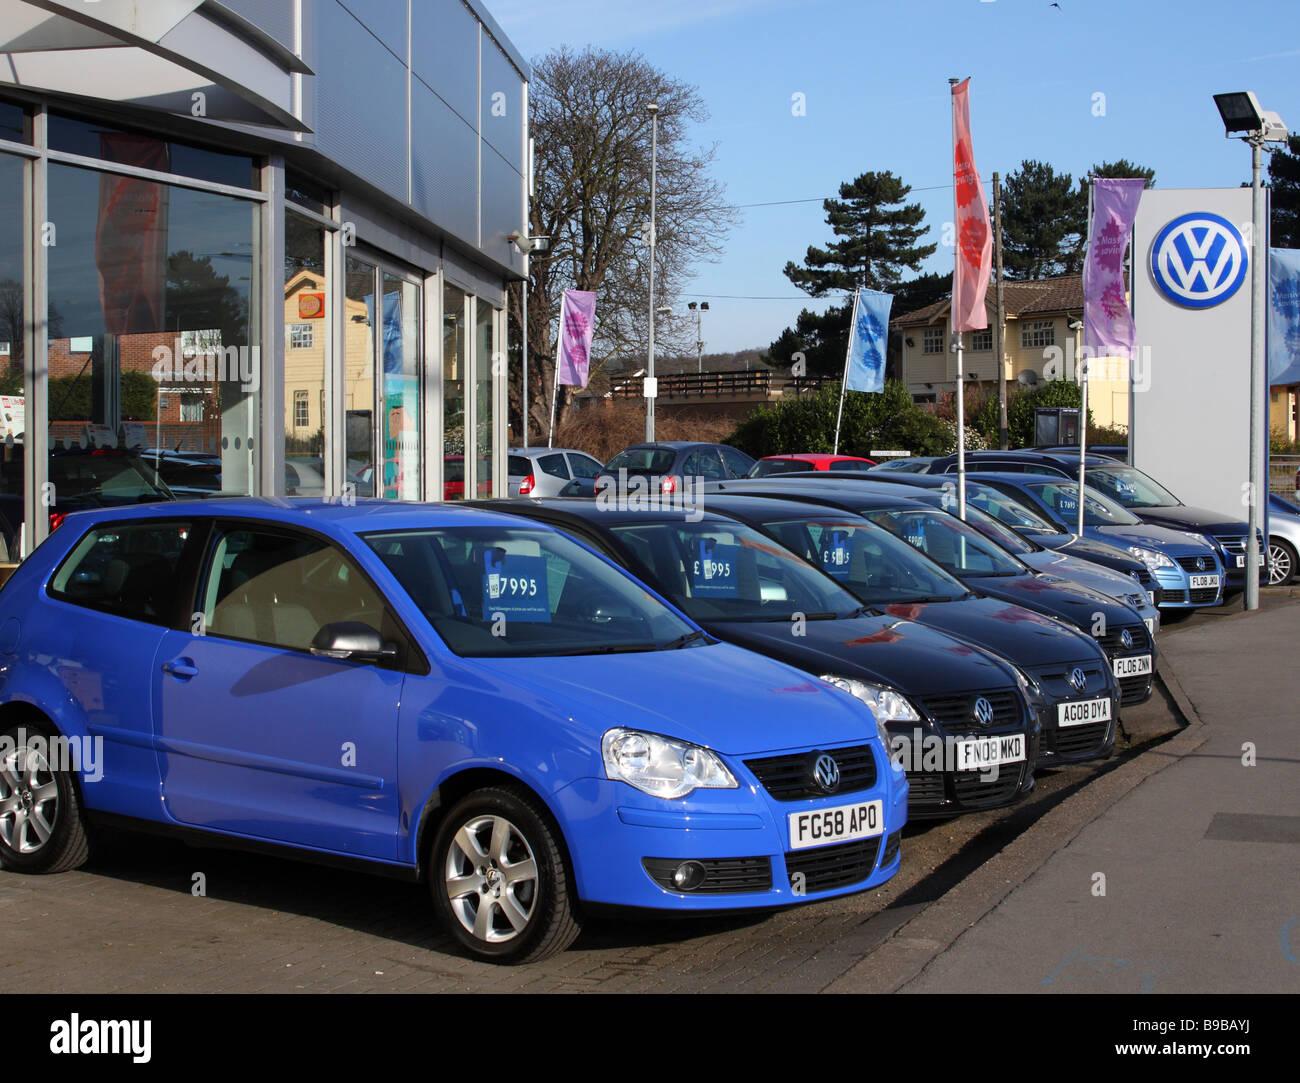 A VW dealership in a U.K. city. - Stock Image